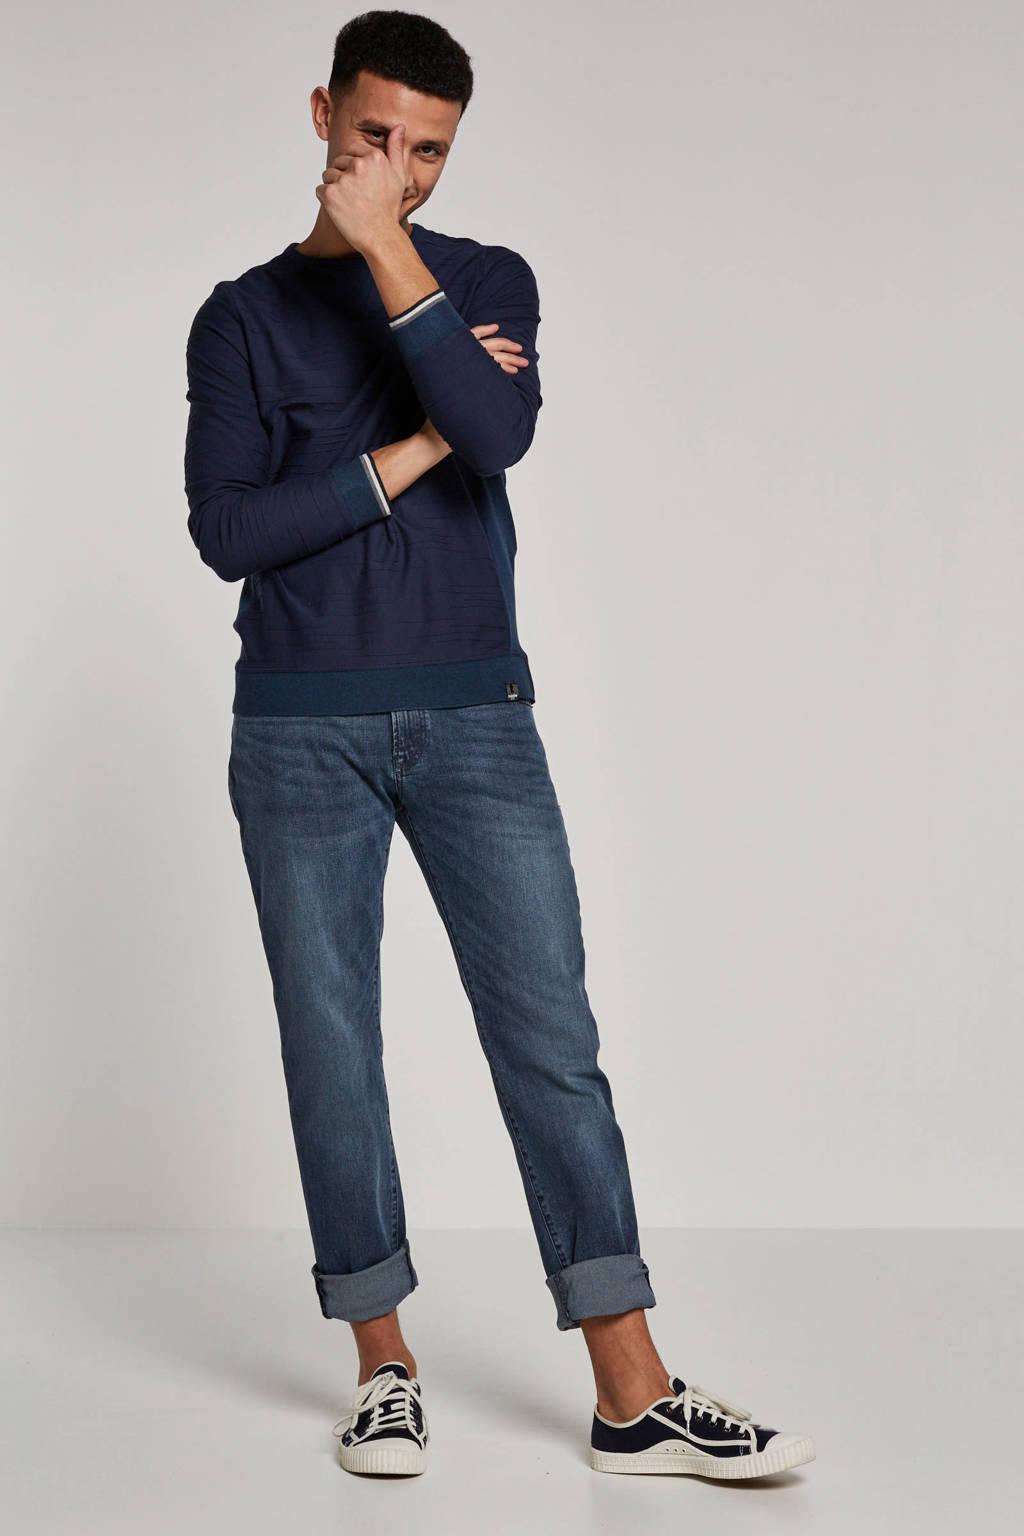 Twinlife T-shirt lange mouw, Donkerblauw